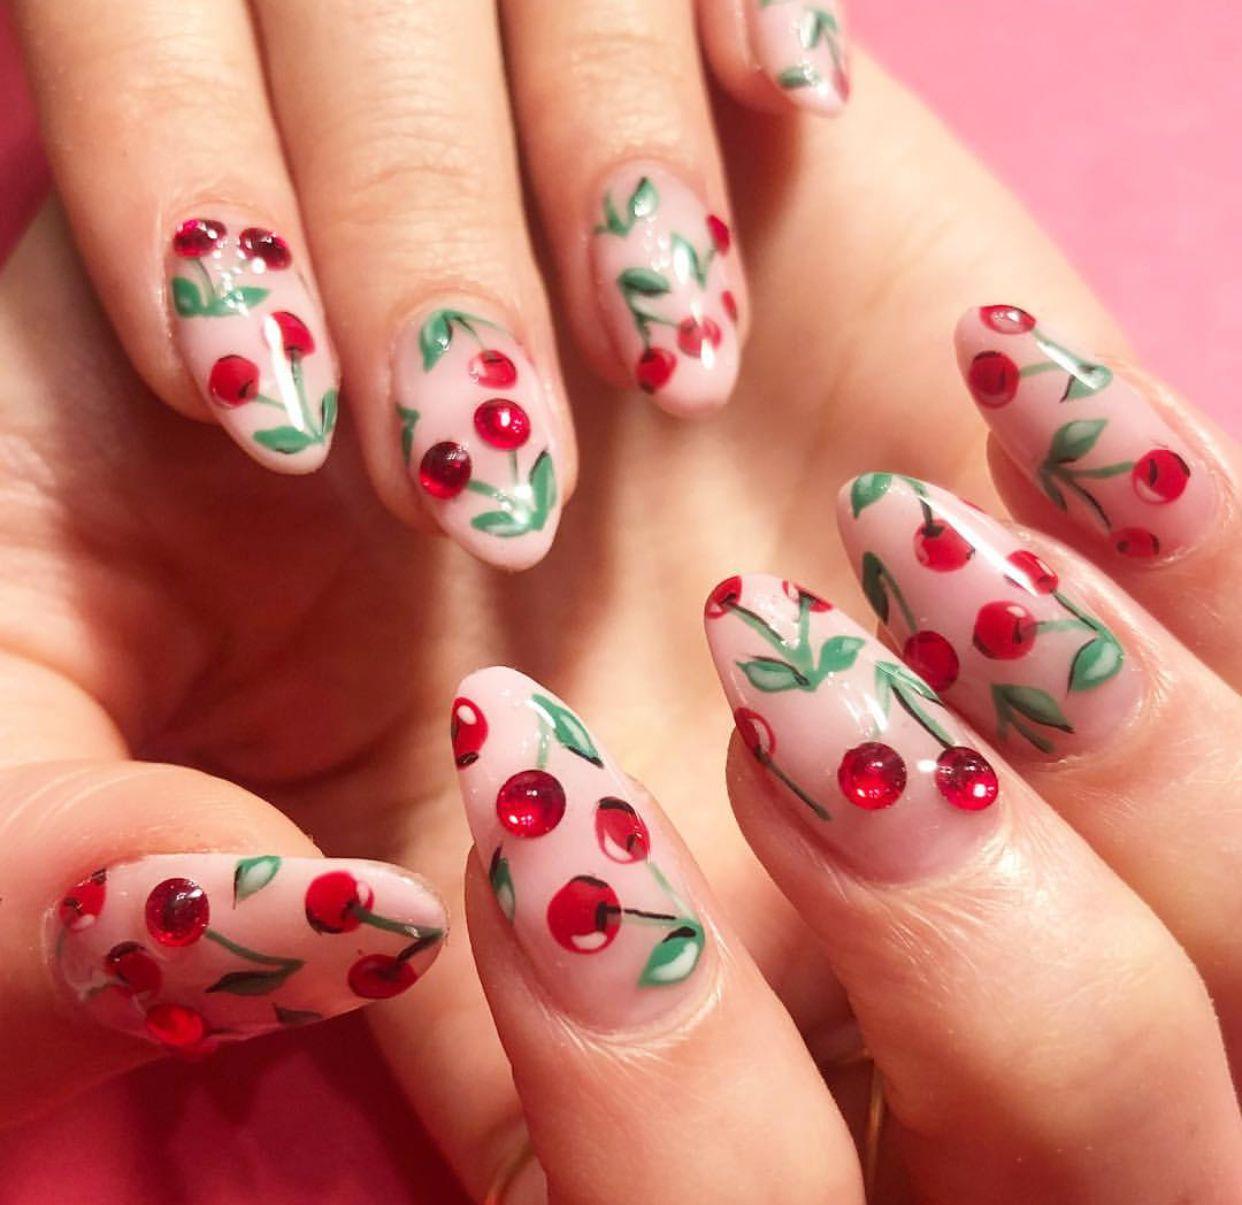 Top 5 Nail Art Tips For Beginners Expert Advice: Cherry 🍒 Nail Art Nail Design #nailart #naildesign